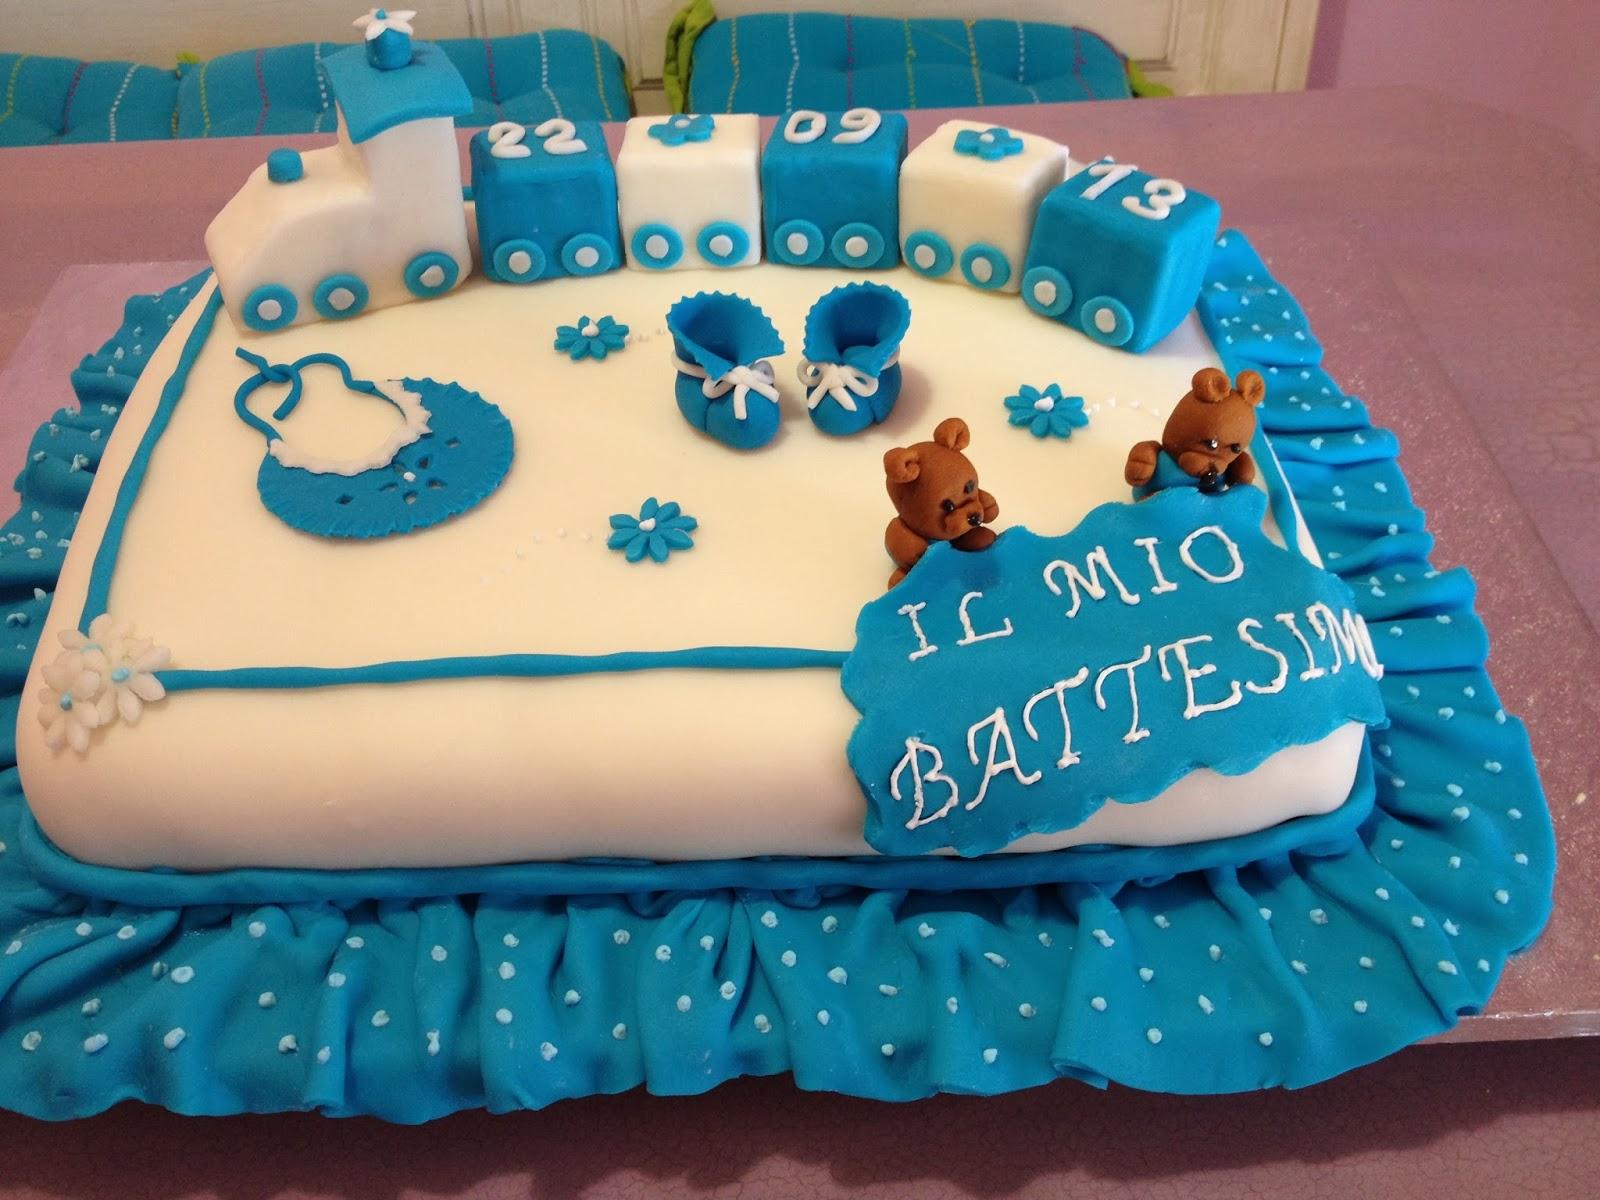 A casa di lory torta battesimo christian for Piani a due piani per la casa